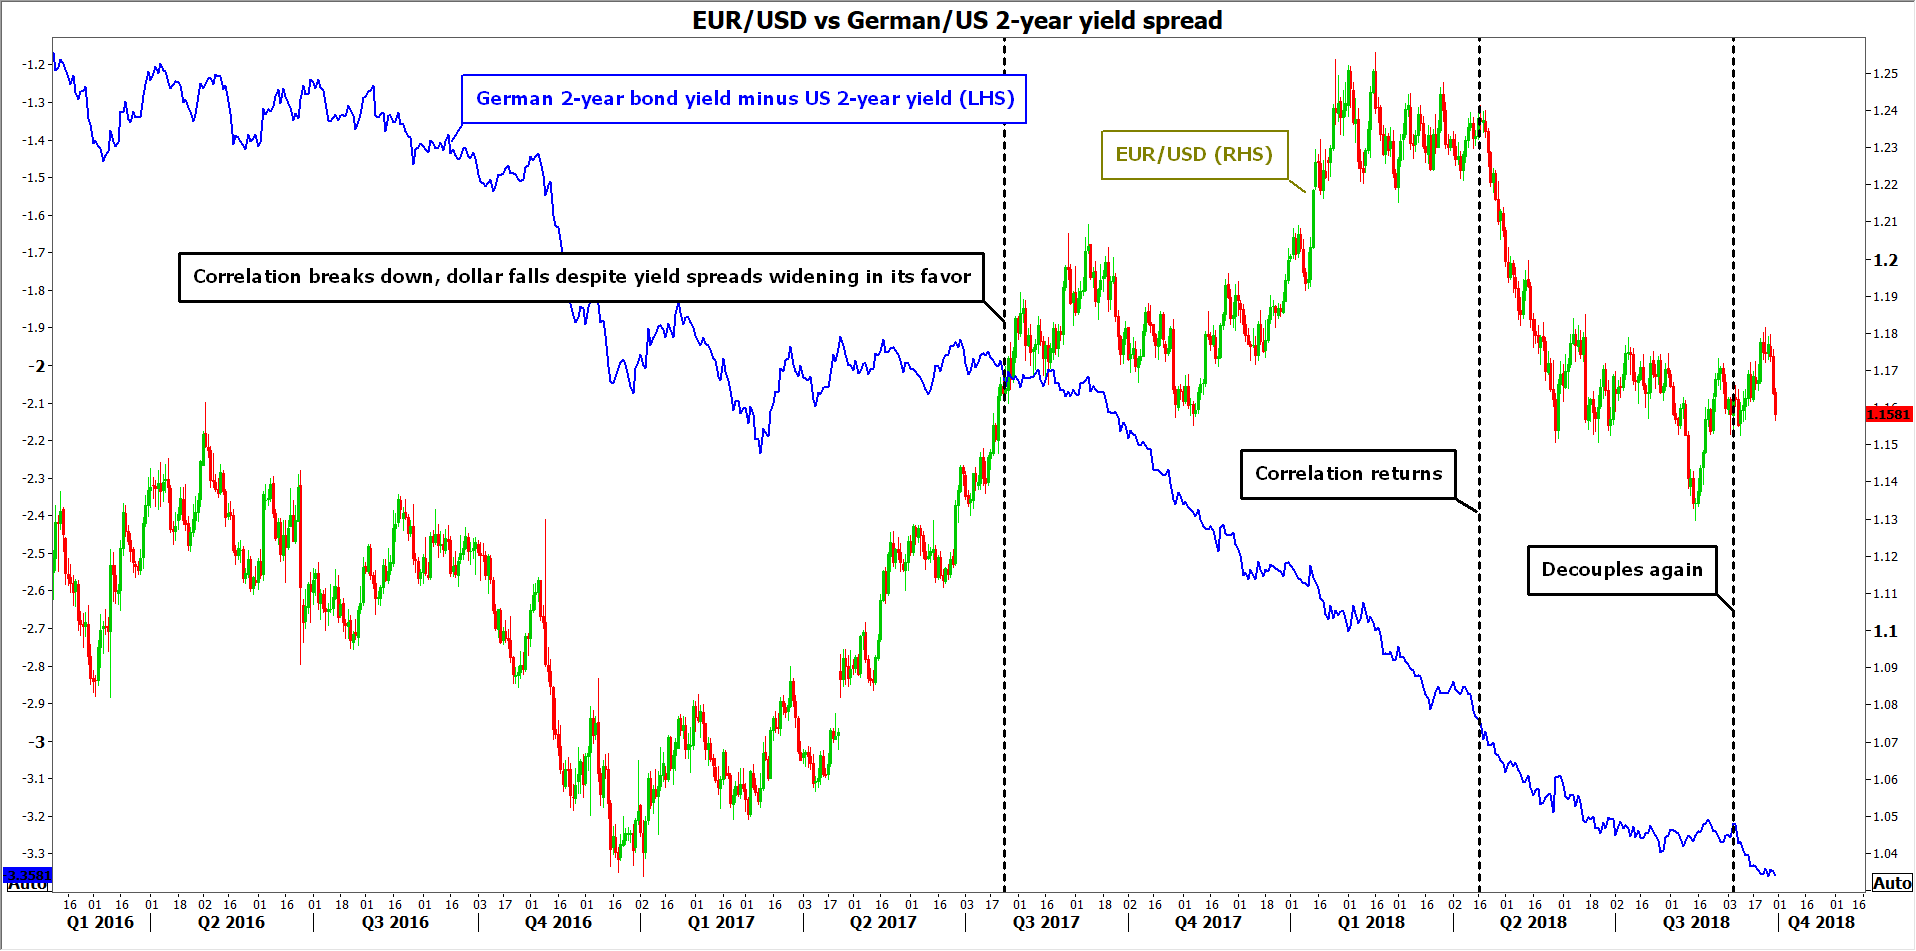 EUR/USD vs yield spreads | EconAlerts